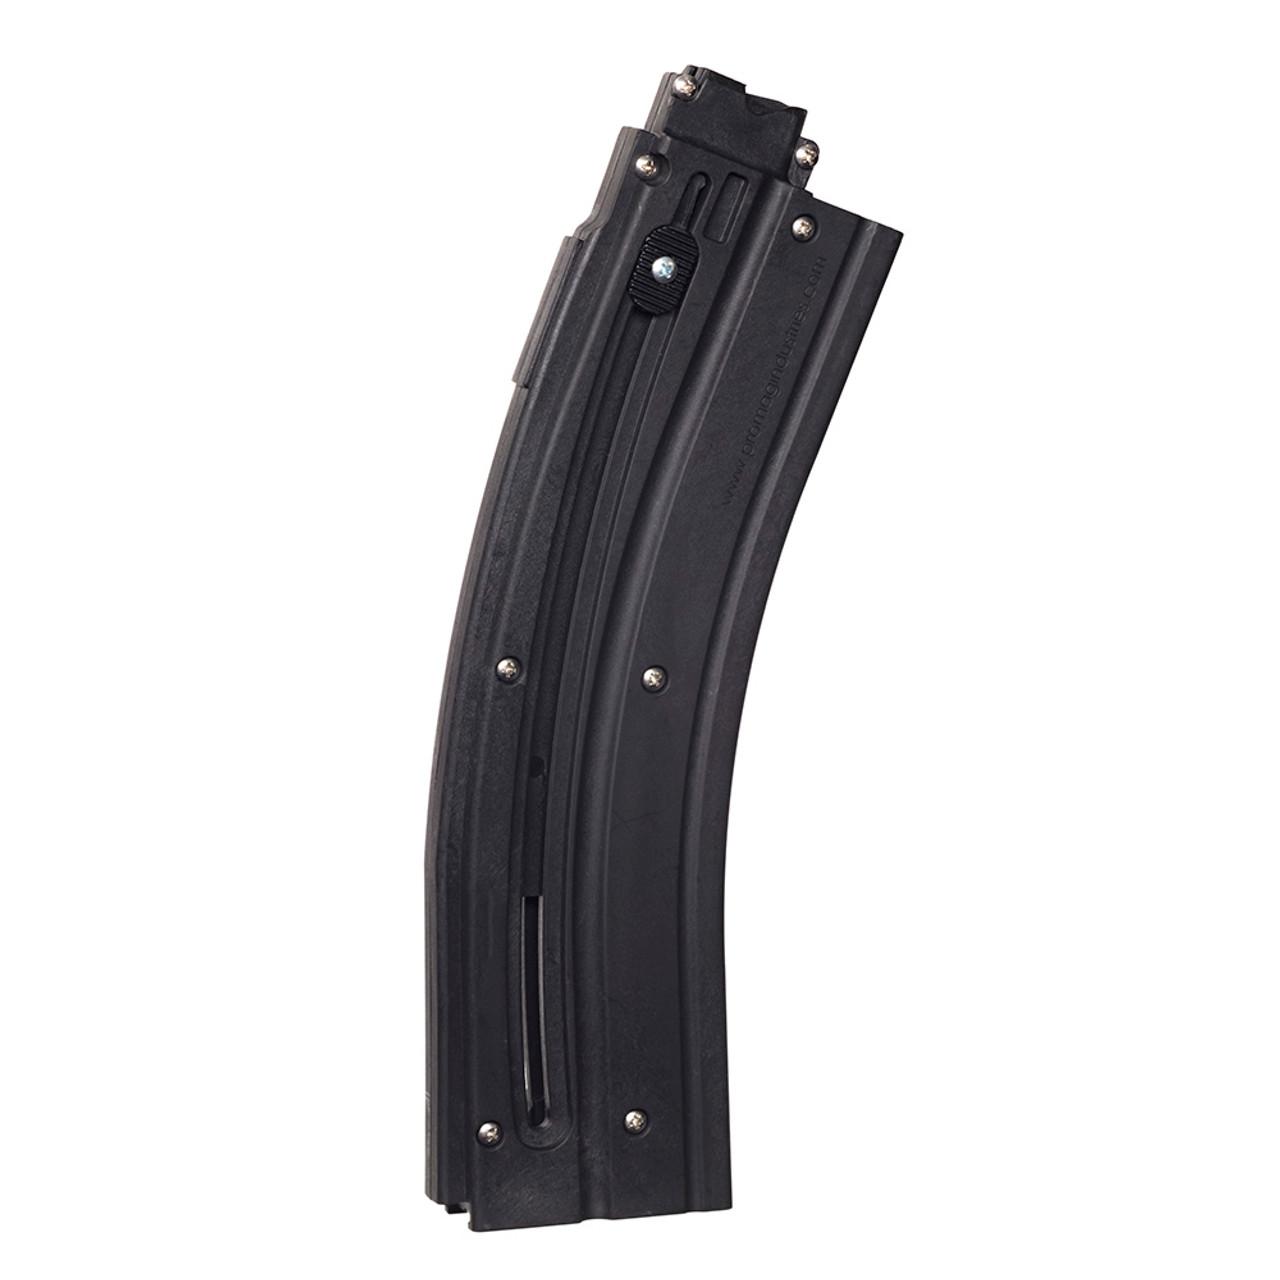 Colt® M4 .22 LR (10) Rd - Black Polymer